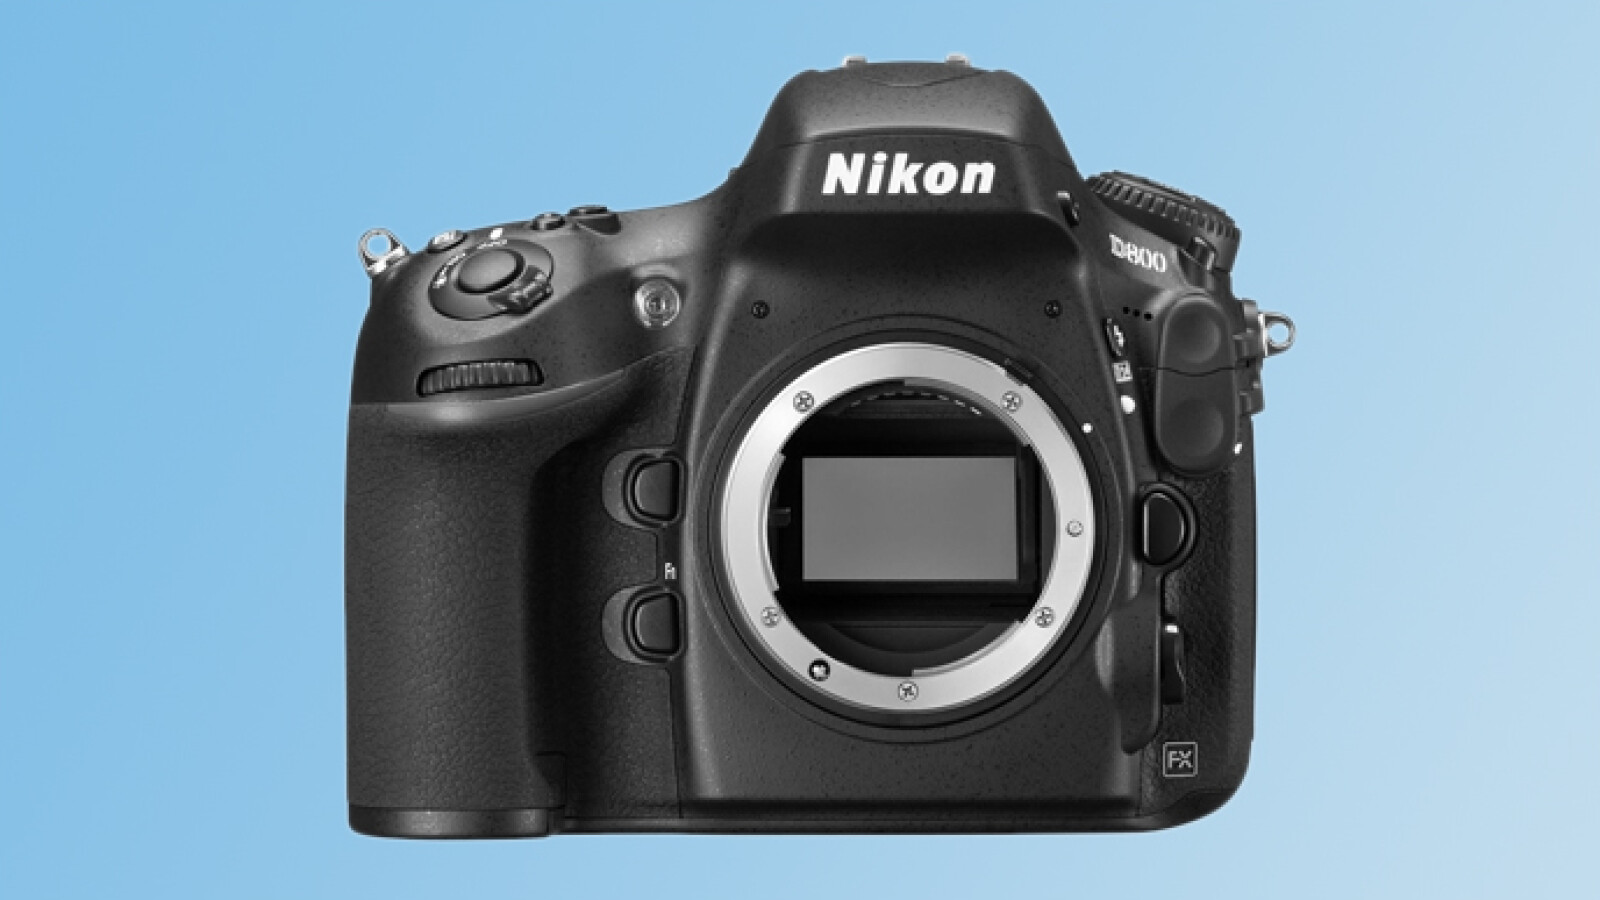 Nikon D800 im Test: Vollformat-DSLR mit 36-Megapixel-Sensor - NETZWELT